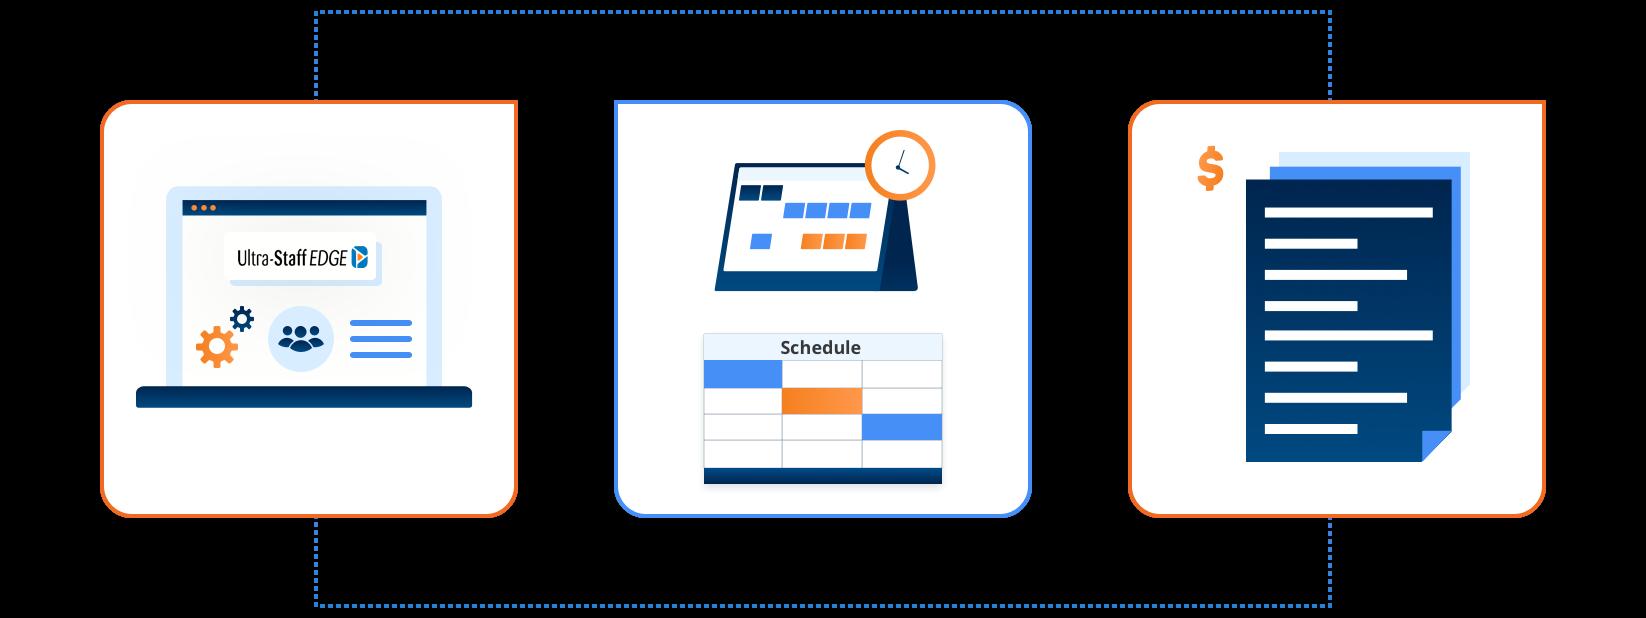 Diagram illustrating Back Office workflow